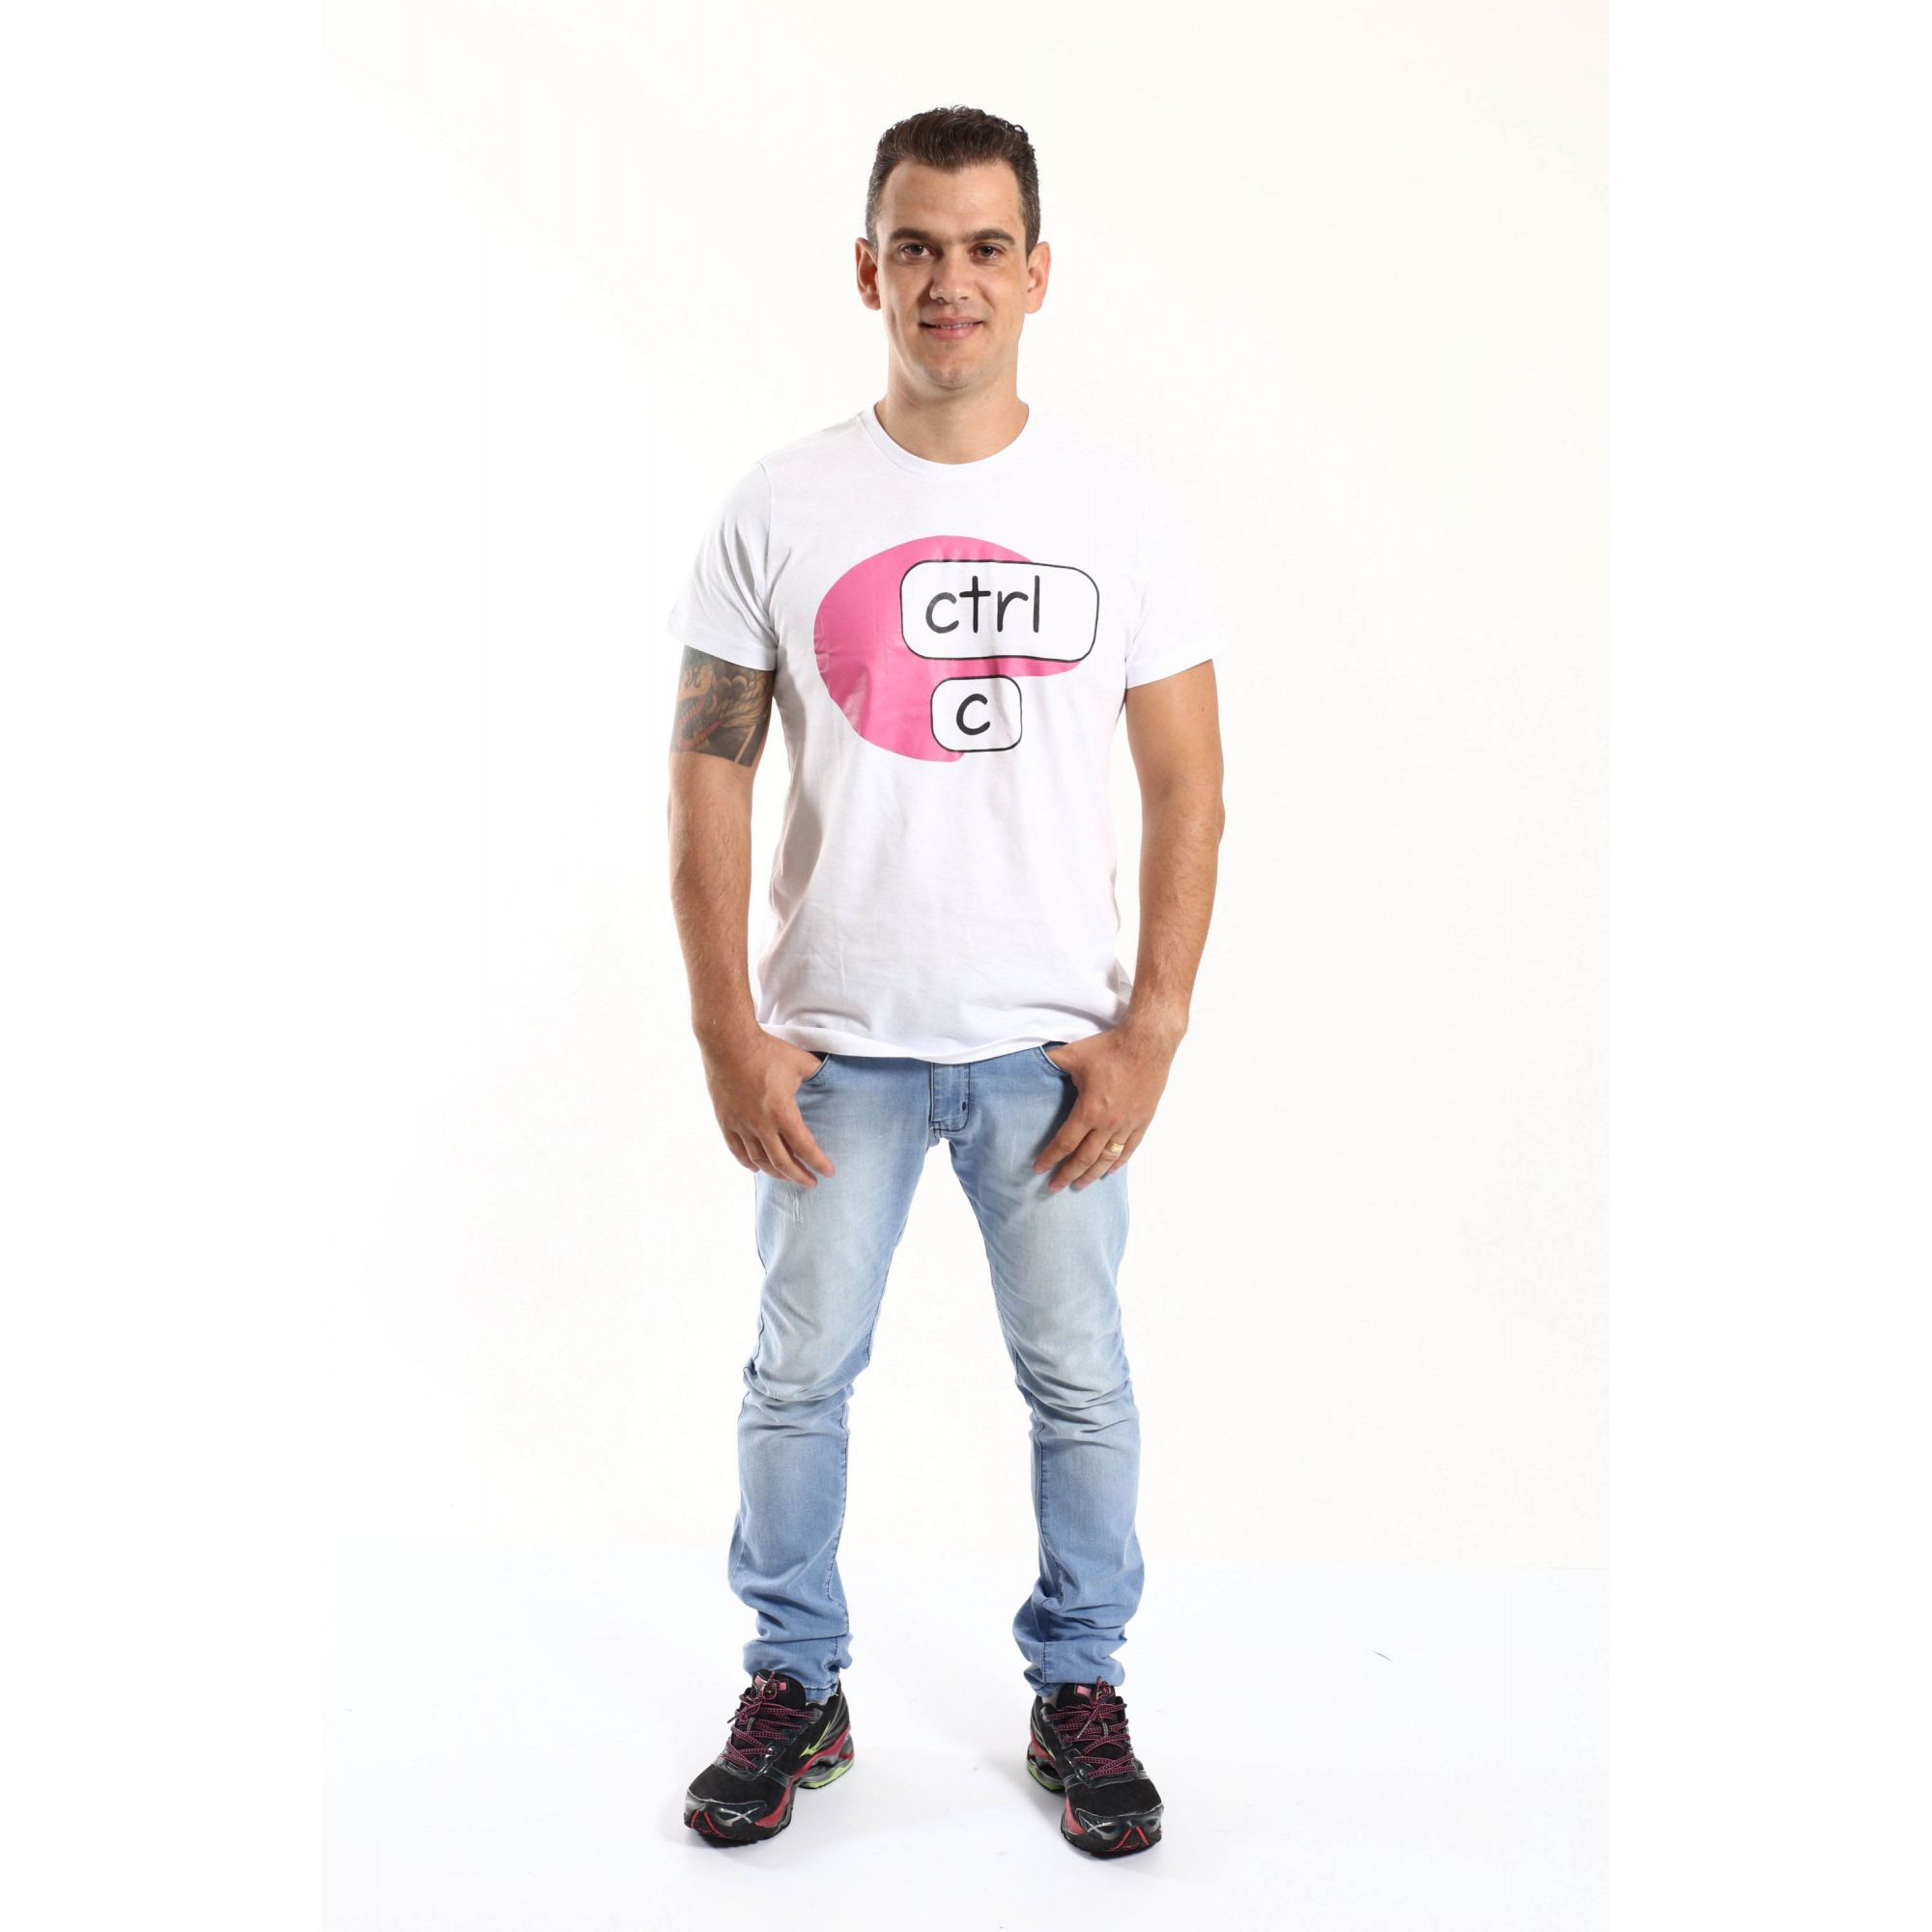 PAI E FILHA > Kit 02 Camisetas Brancas Ctrl+C Ctrl+V [Coleção Tal Pai Tal Filho]  - Heitor Fashion Brazil